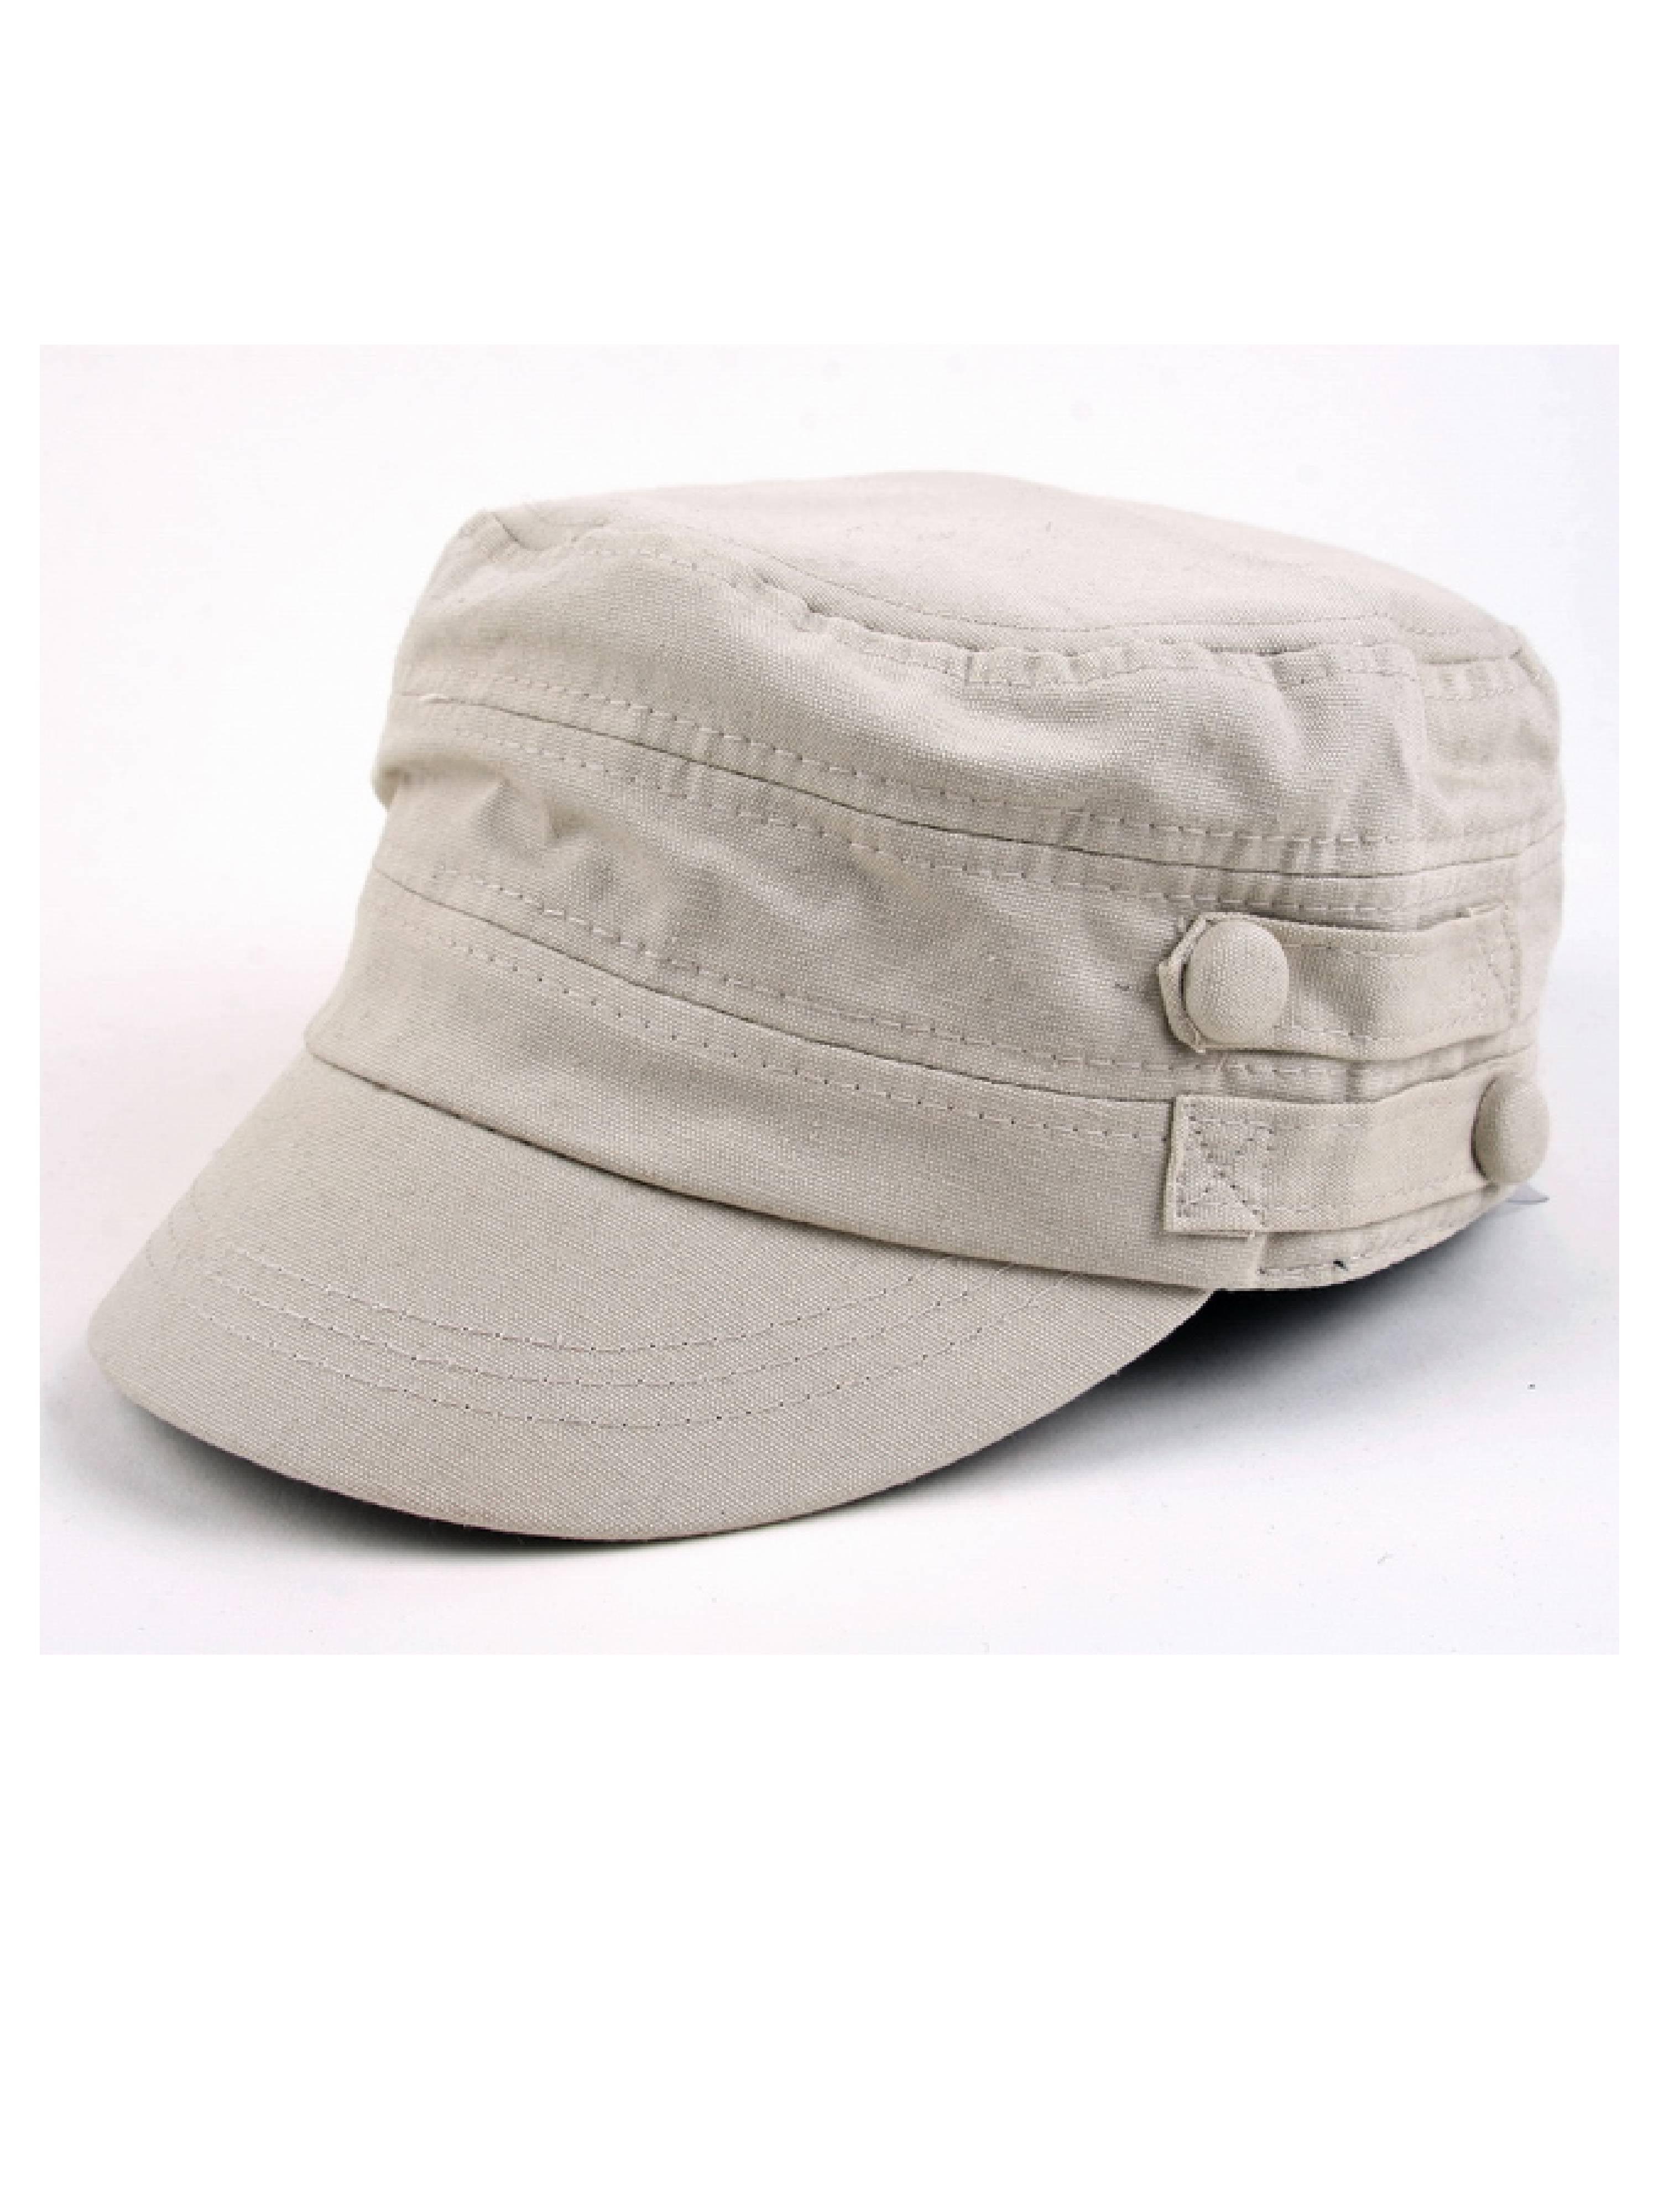 07c09d2d108 Spring Summer Military Inspired Cadet Hat P154 - Walmart.com